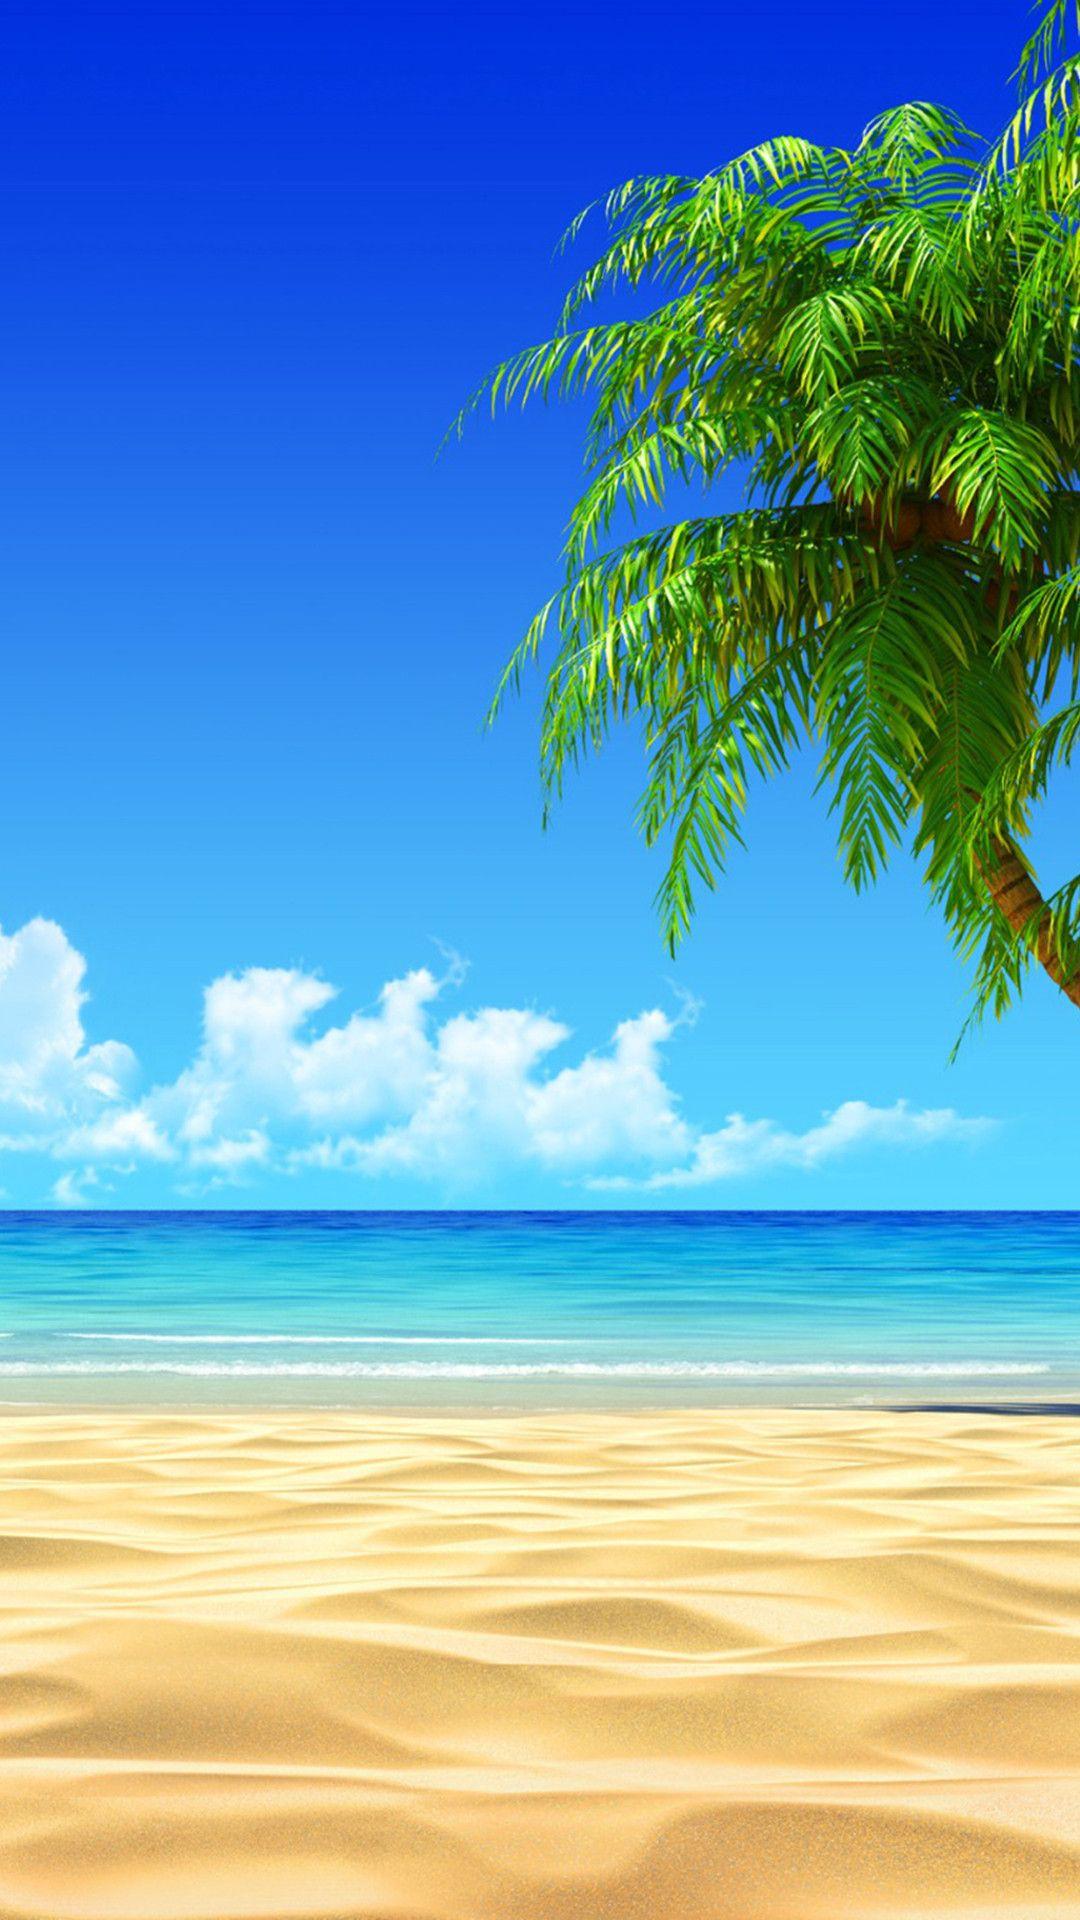 Iphone 6 Plus Wallpaper 1080x19 Iphonex スマホ壁紙 待受画像ギャラリー 美しい風景 夏 絵 美しい風景写真